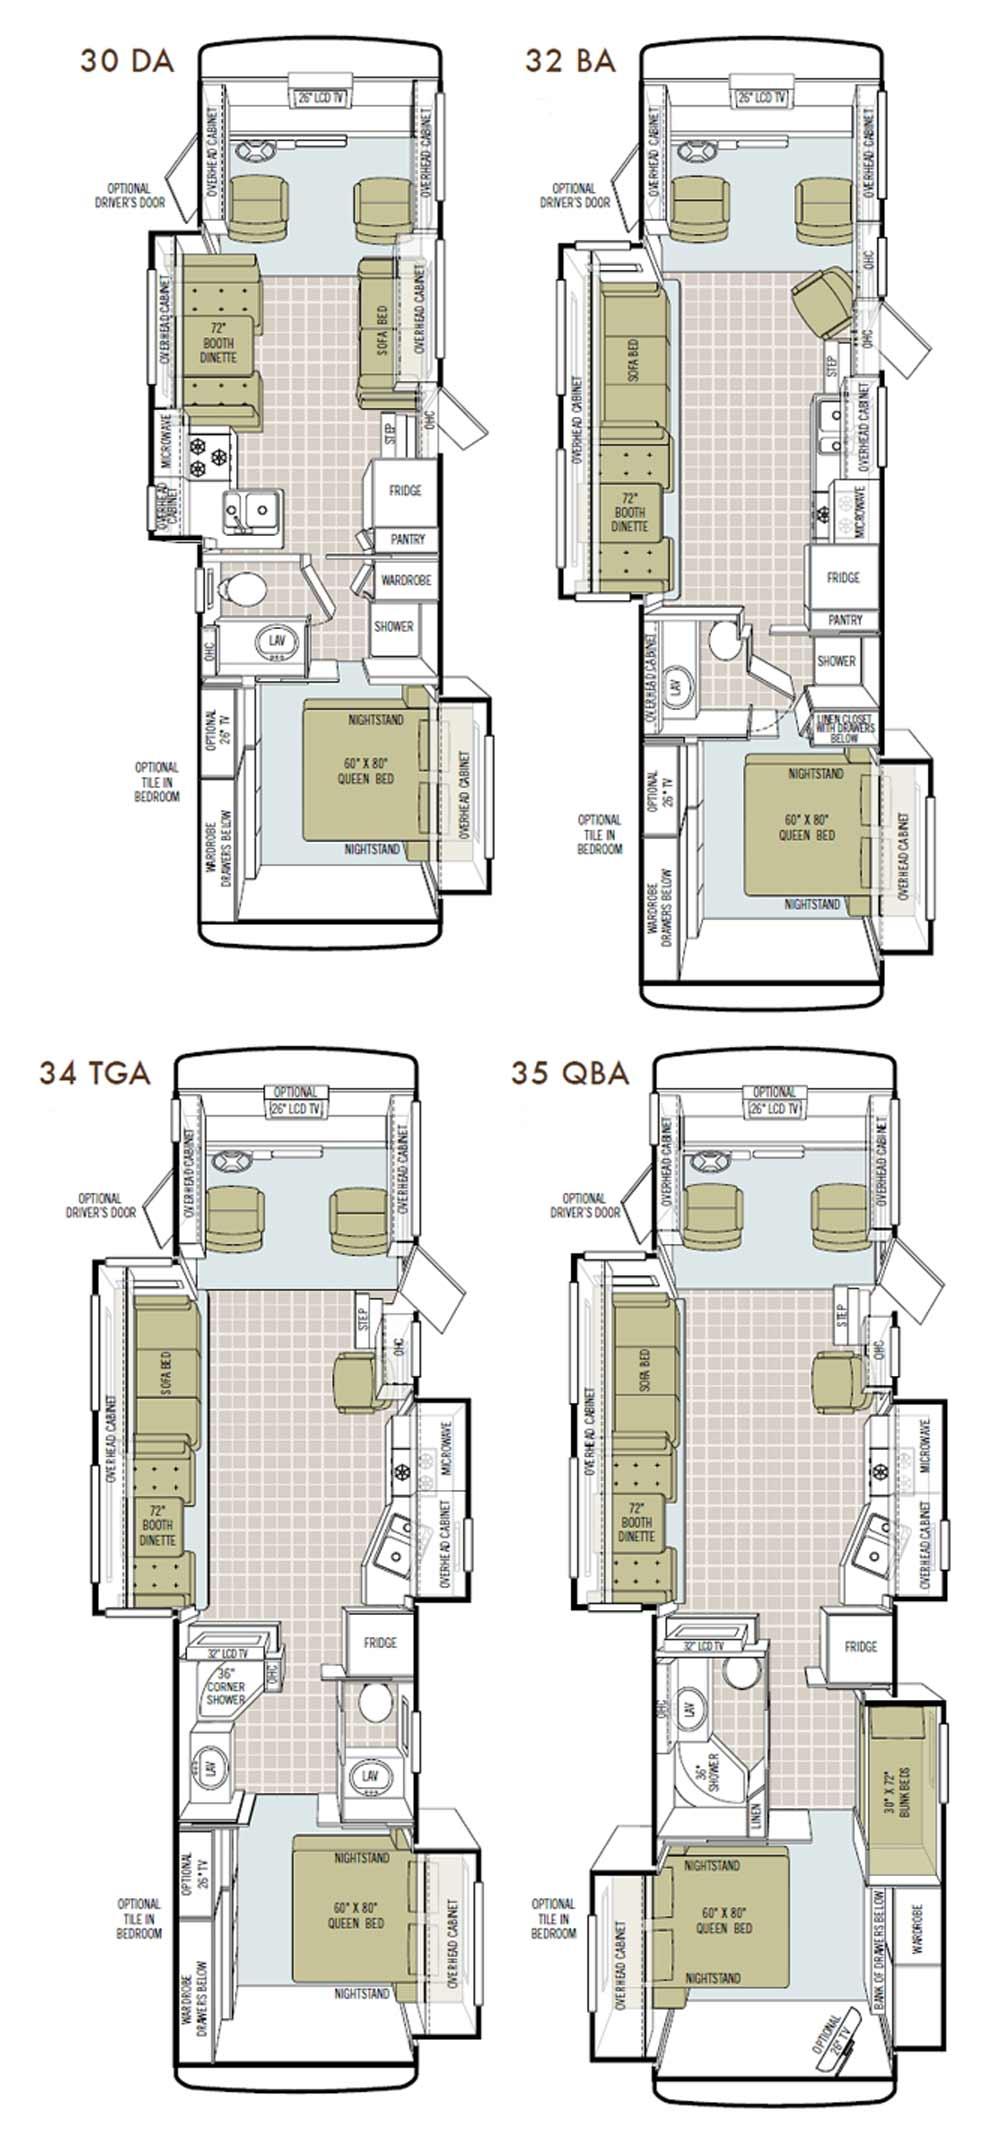 Tiffin Allegro class A motorhome floorplans - 4 floorplans available